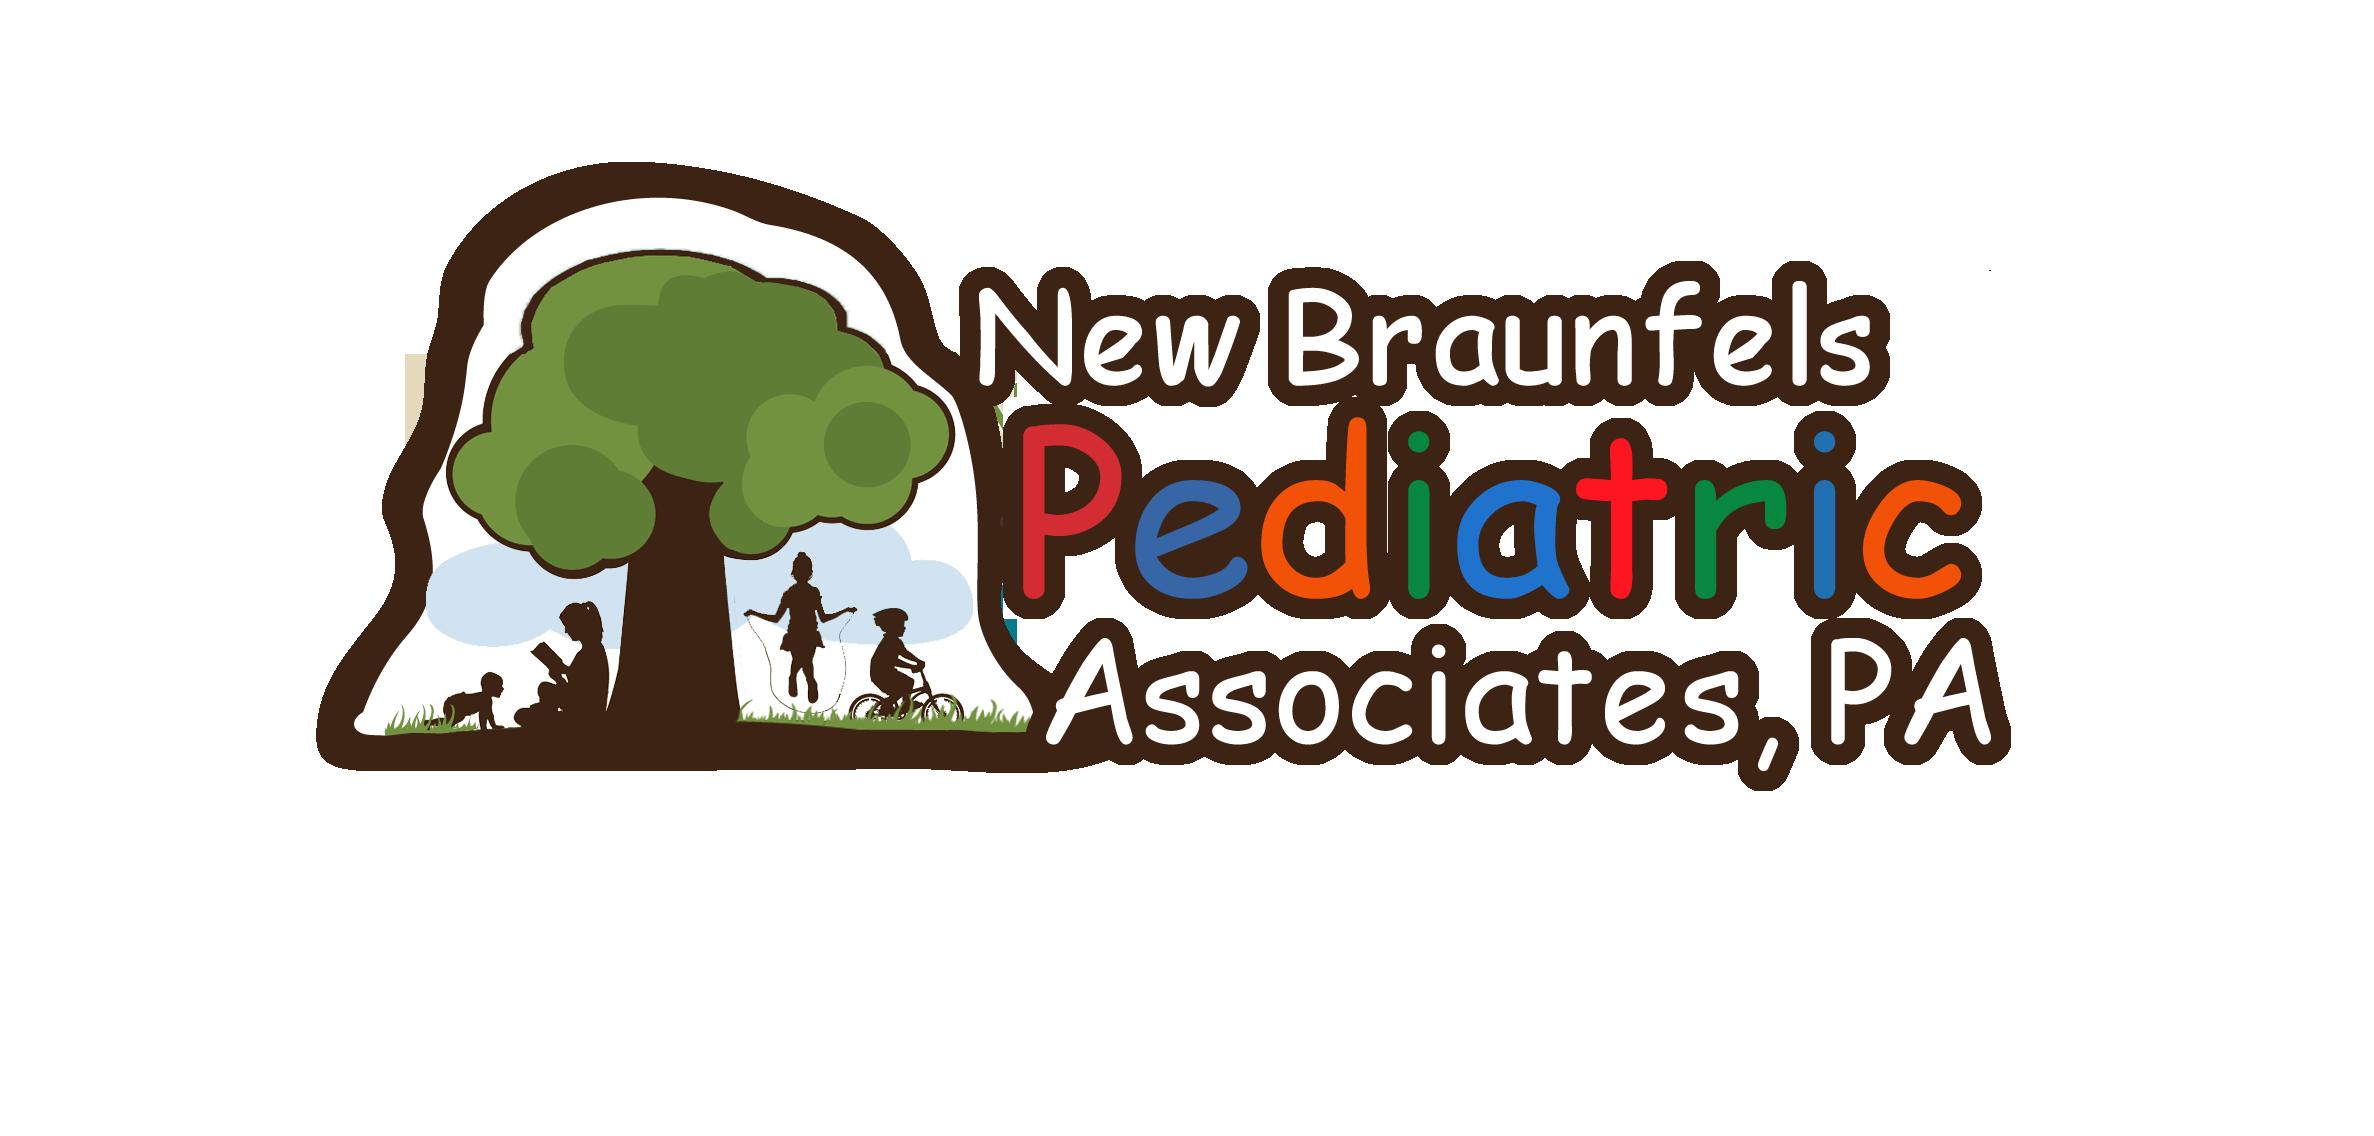 Shot clipart pediatrics. New braunfels pediatric associates